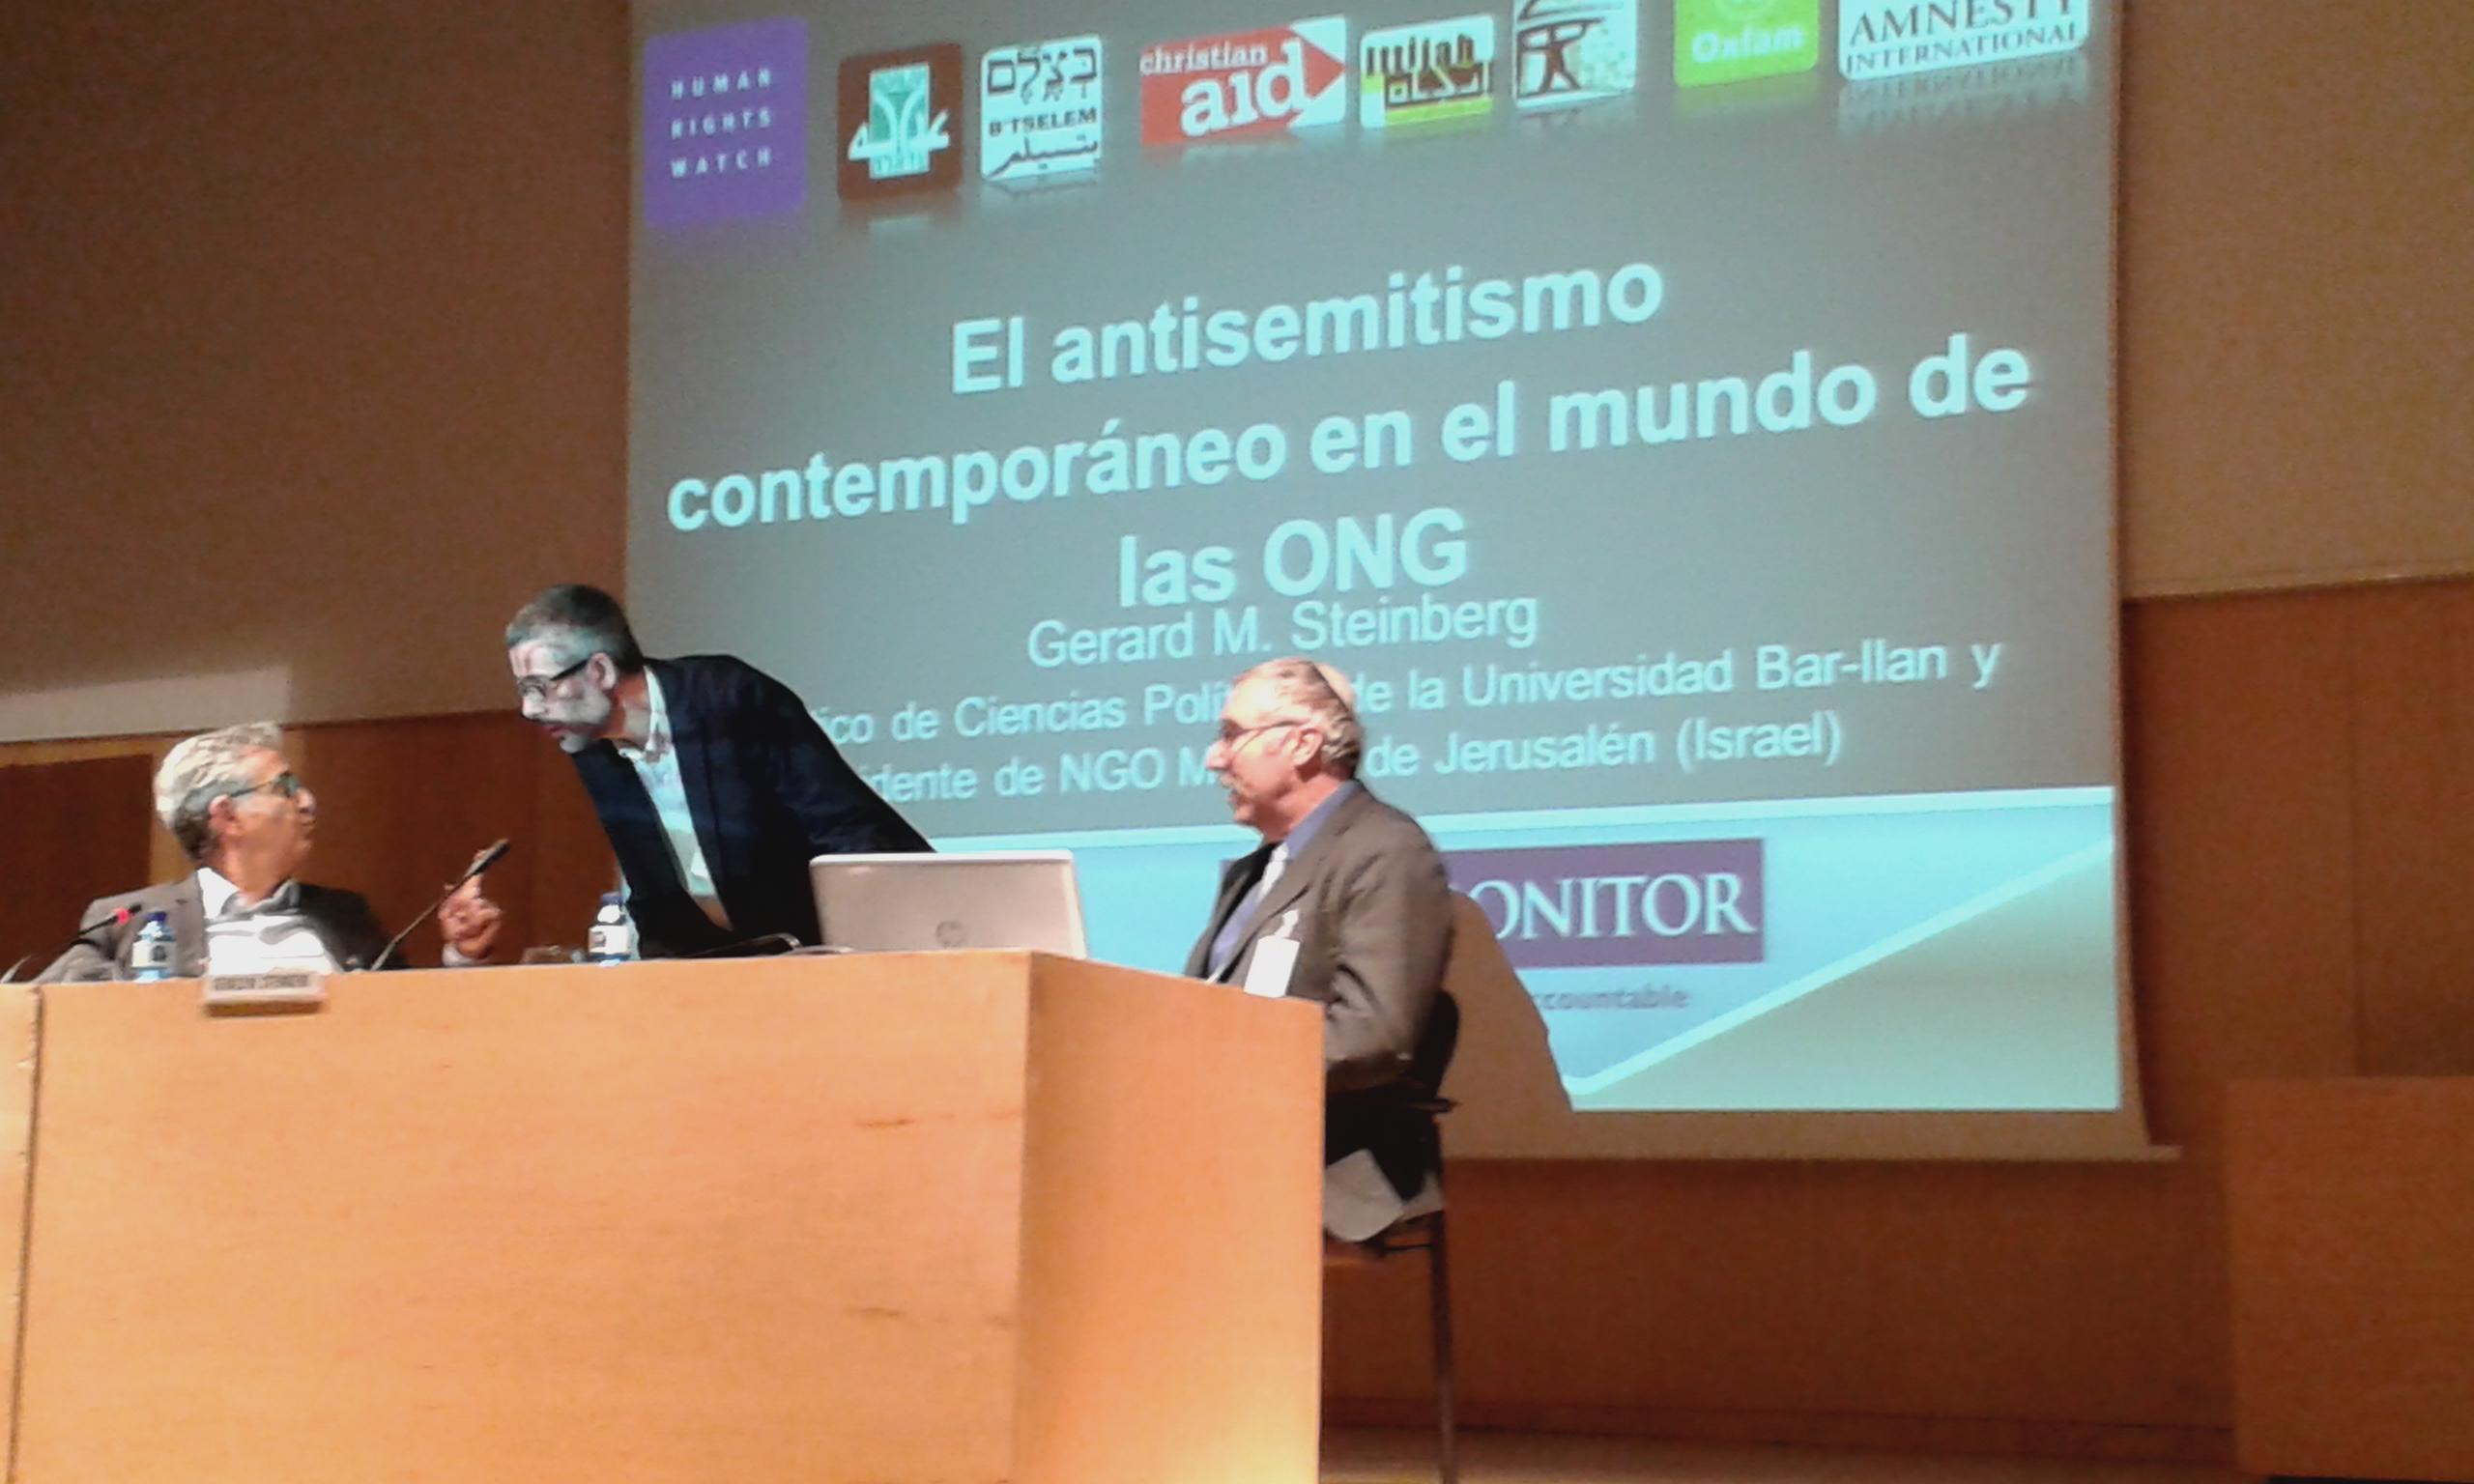 David Grebler, President, Fundacion Baruch Spinoza Prof. Xavier Torrens, University of Barcelona and Prof. Gerald Steinberg at the third seminar on antisemitism, held in Barcelona, Nov. 5, 2014